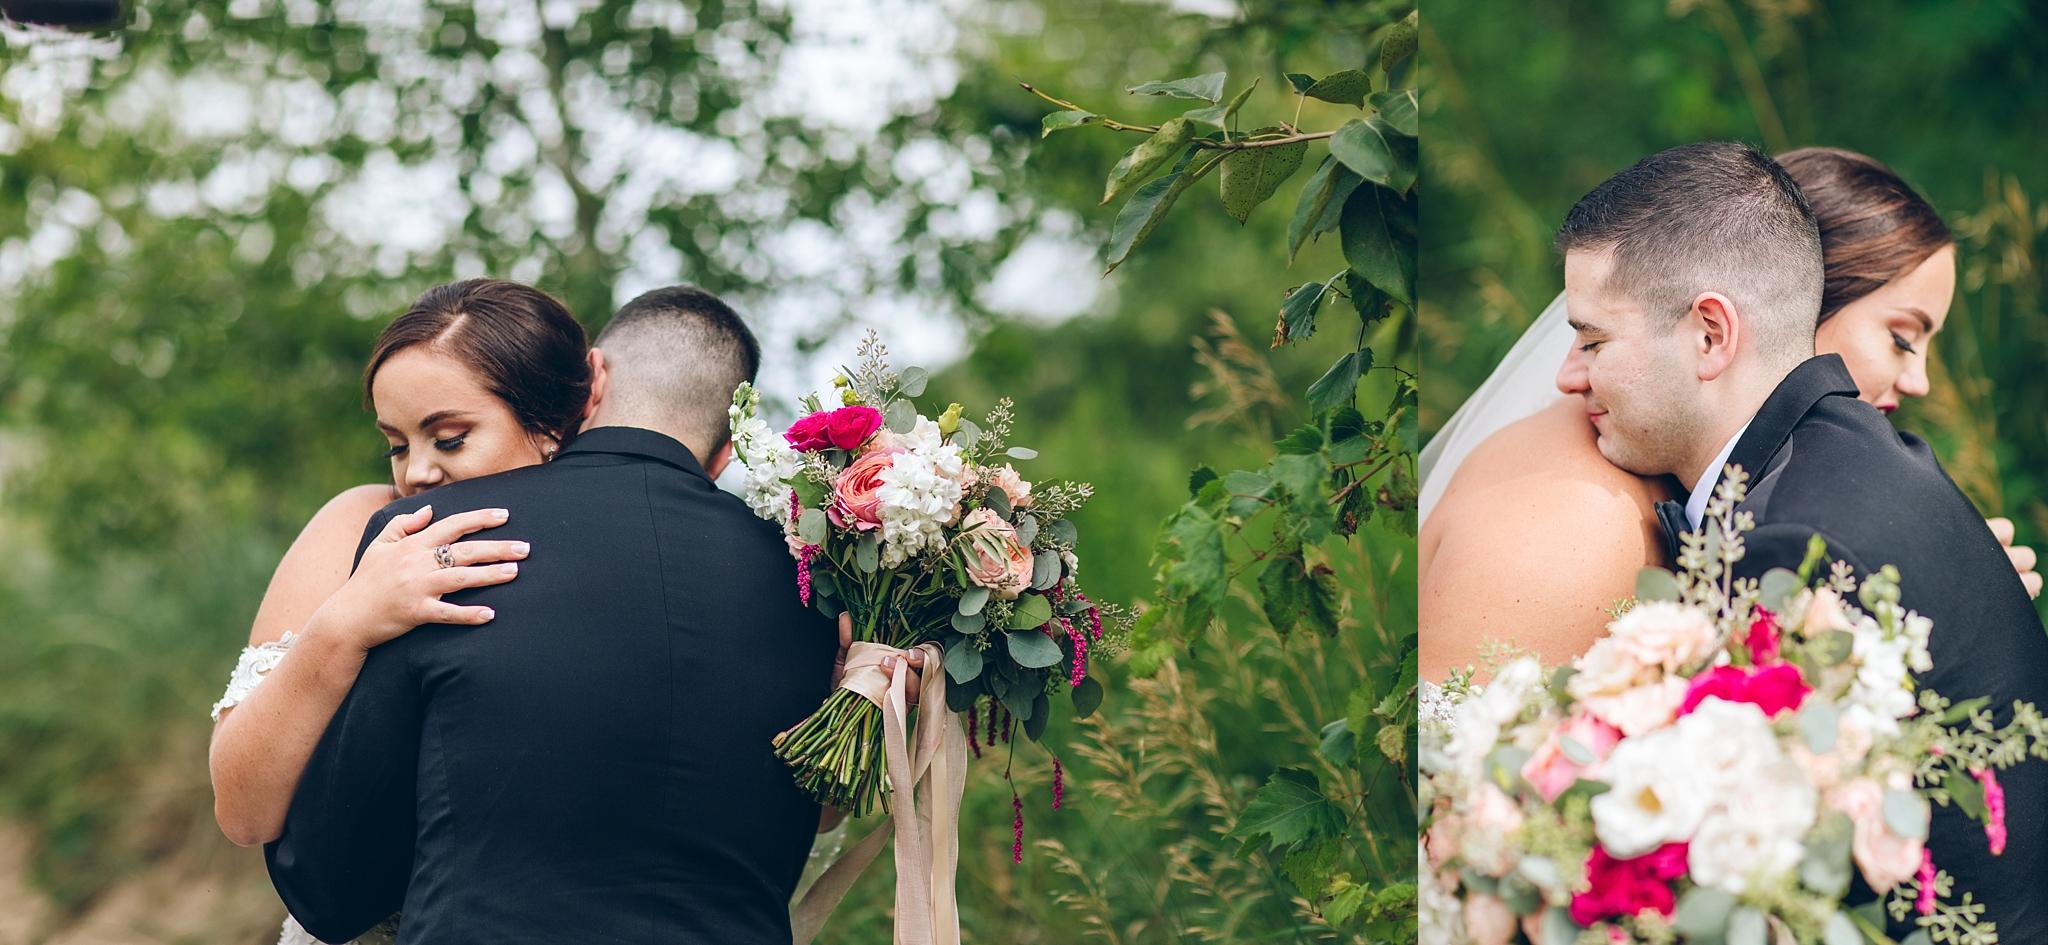 baker-lofts-holland-michigan-wedding-photographer_0335.jpg